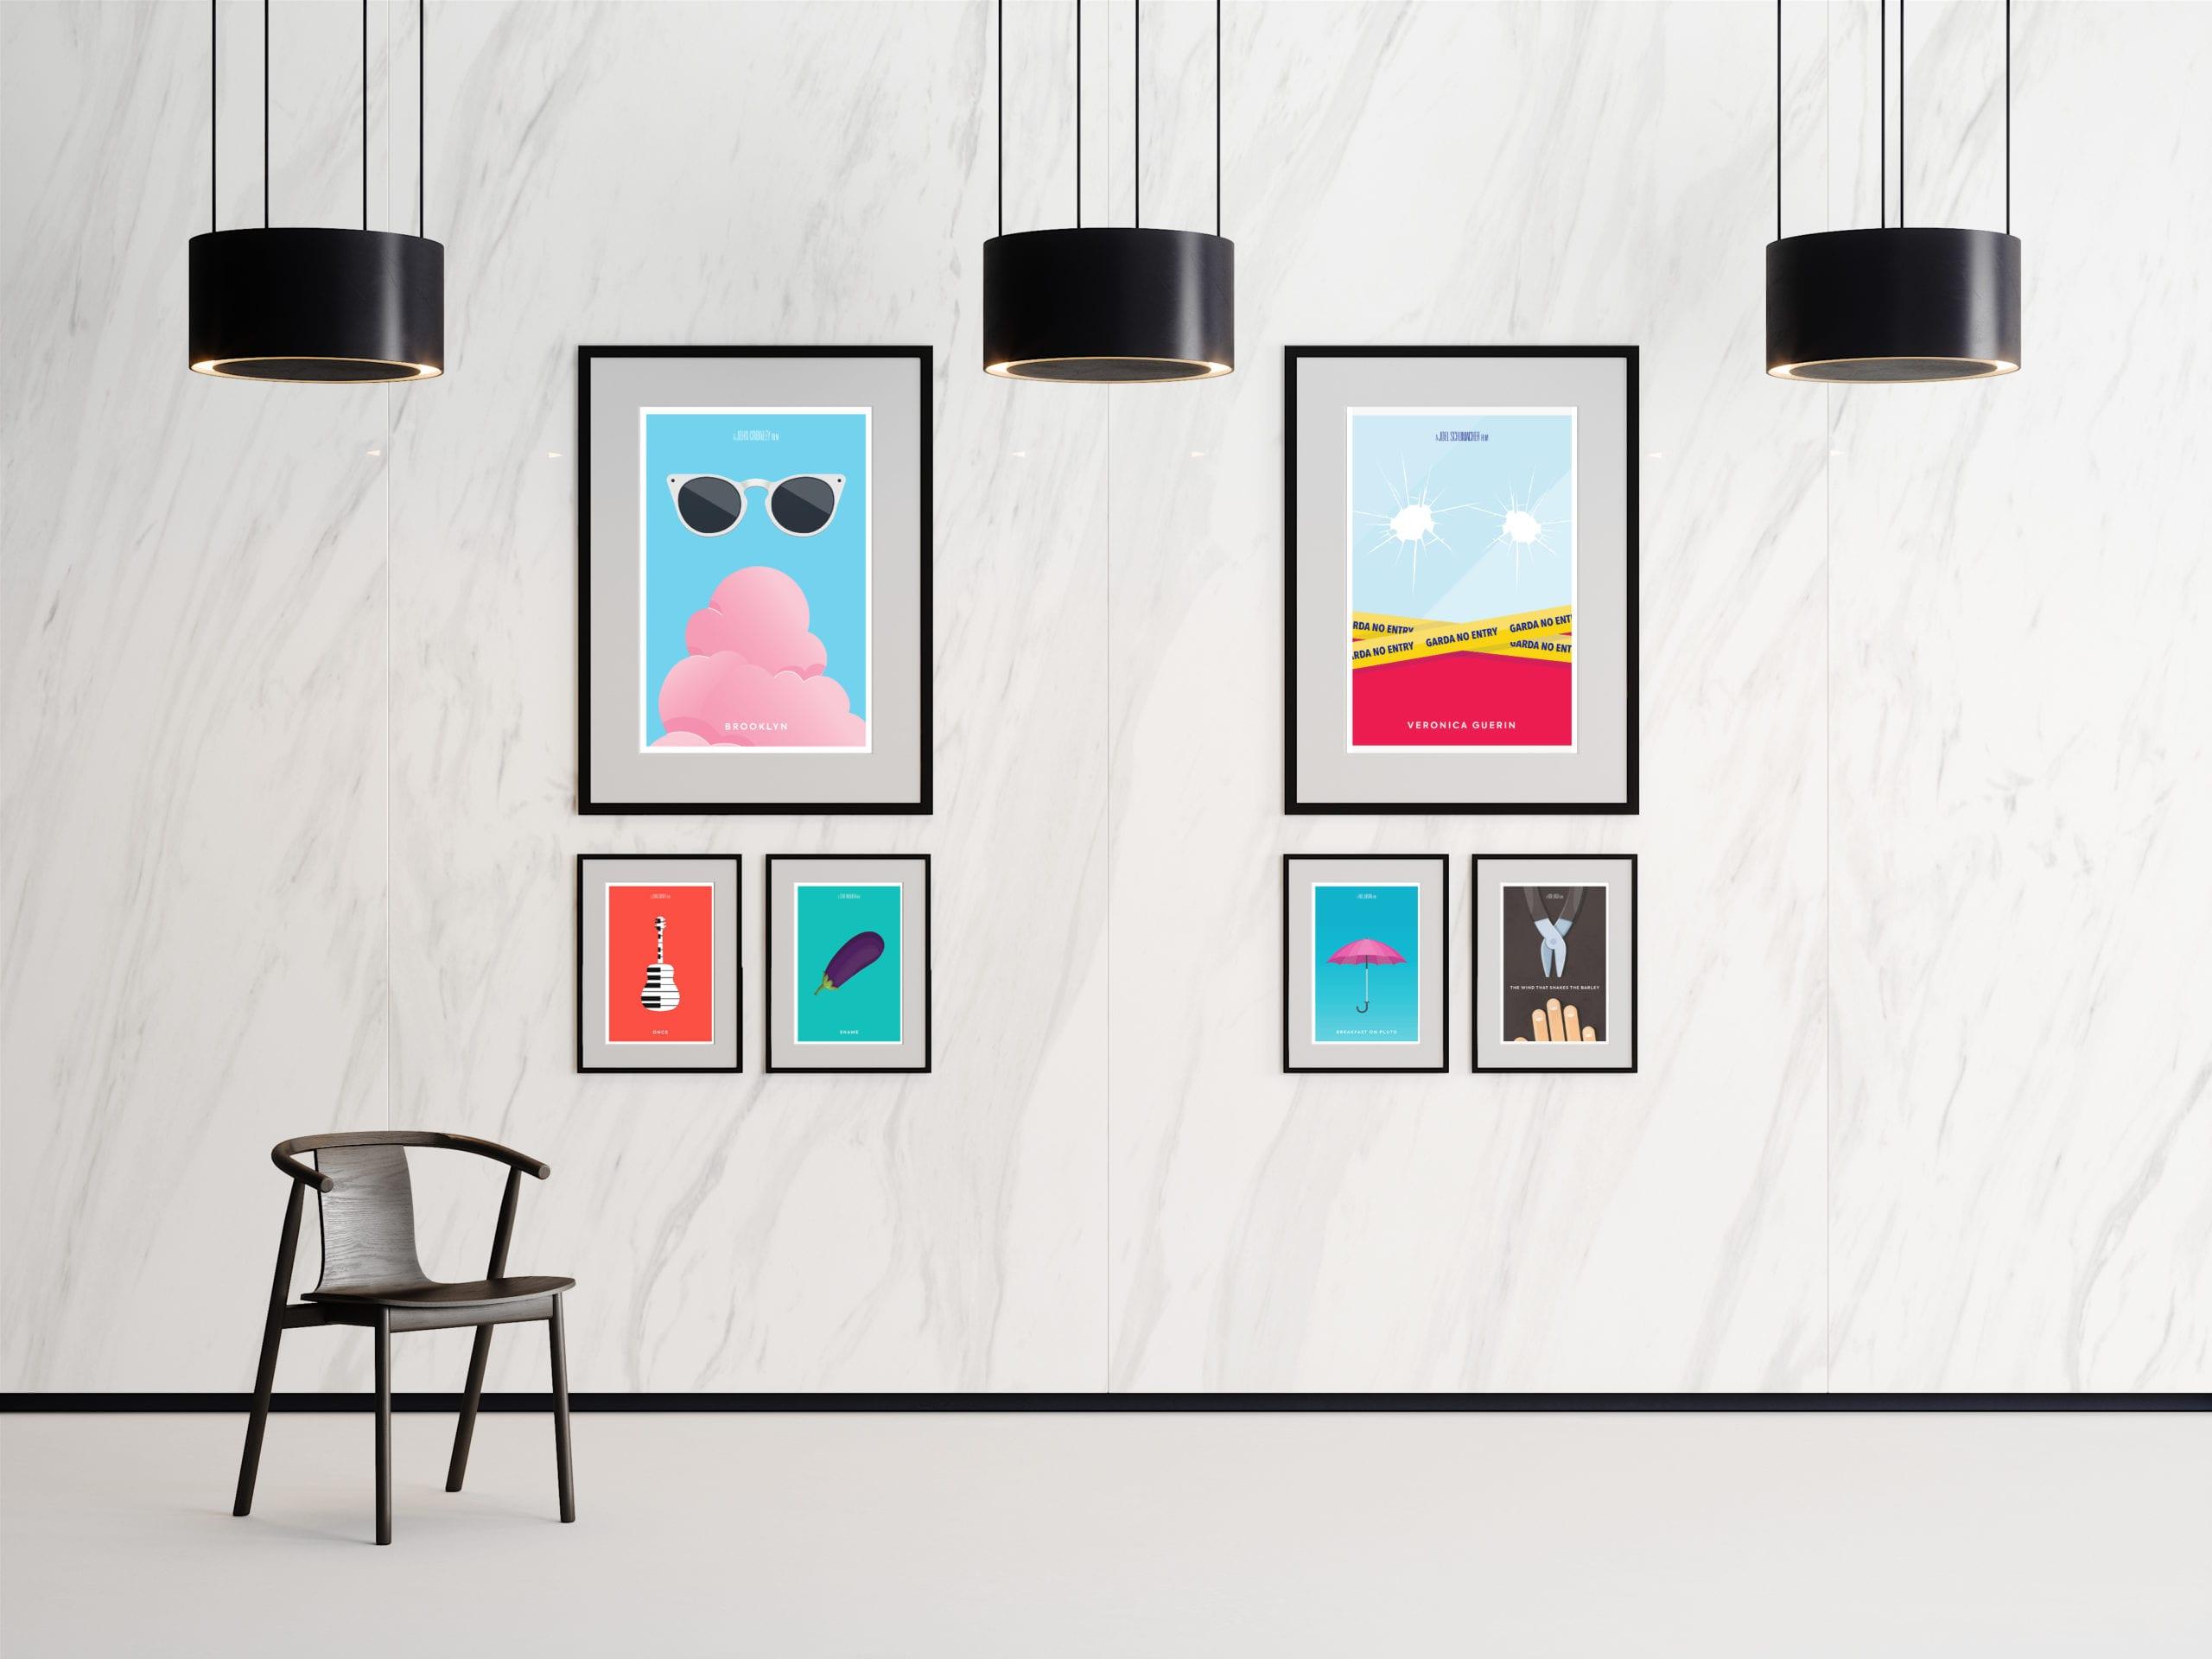 Ray-Hurley-Minimalist-Movie-Posters-Contact-Header